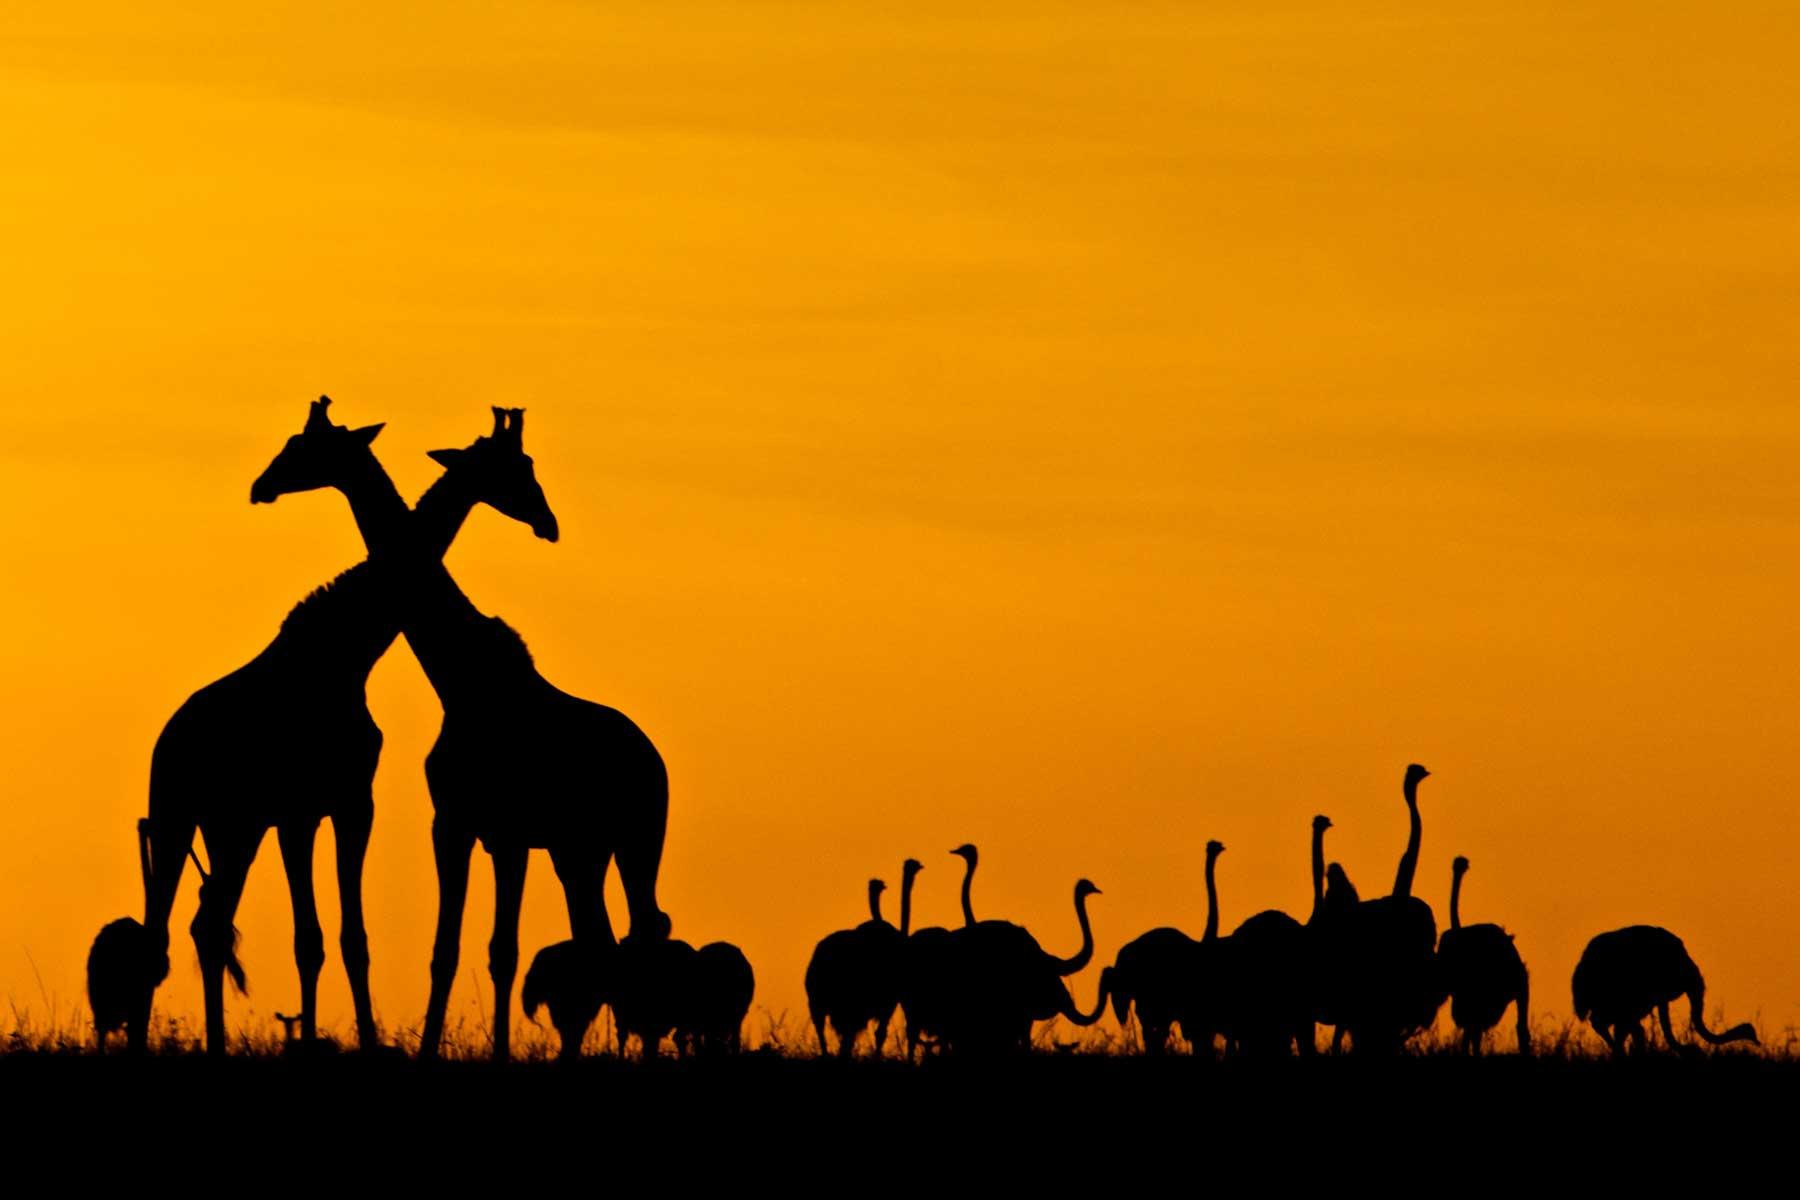 Warren Samuels: Naturalist, documentary cameraman, and guide extraordinaire